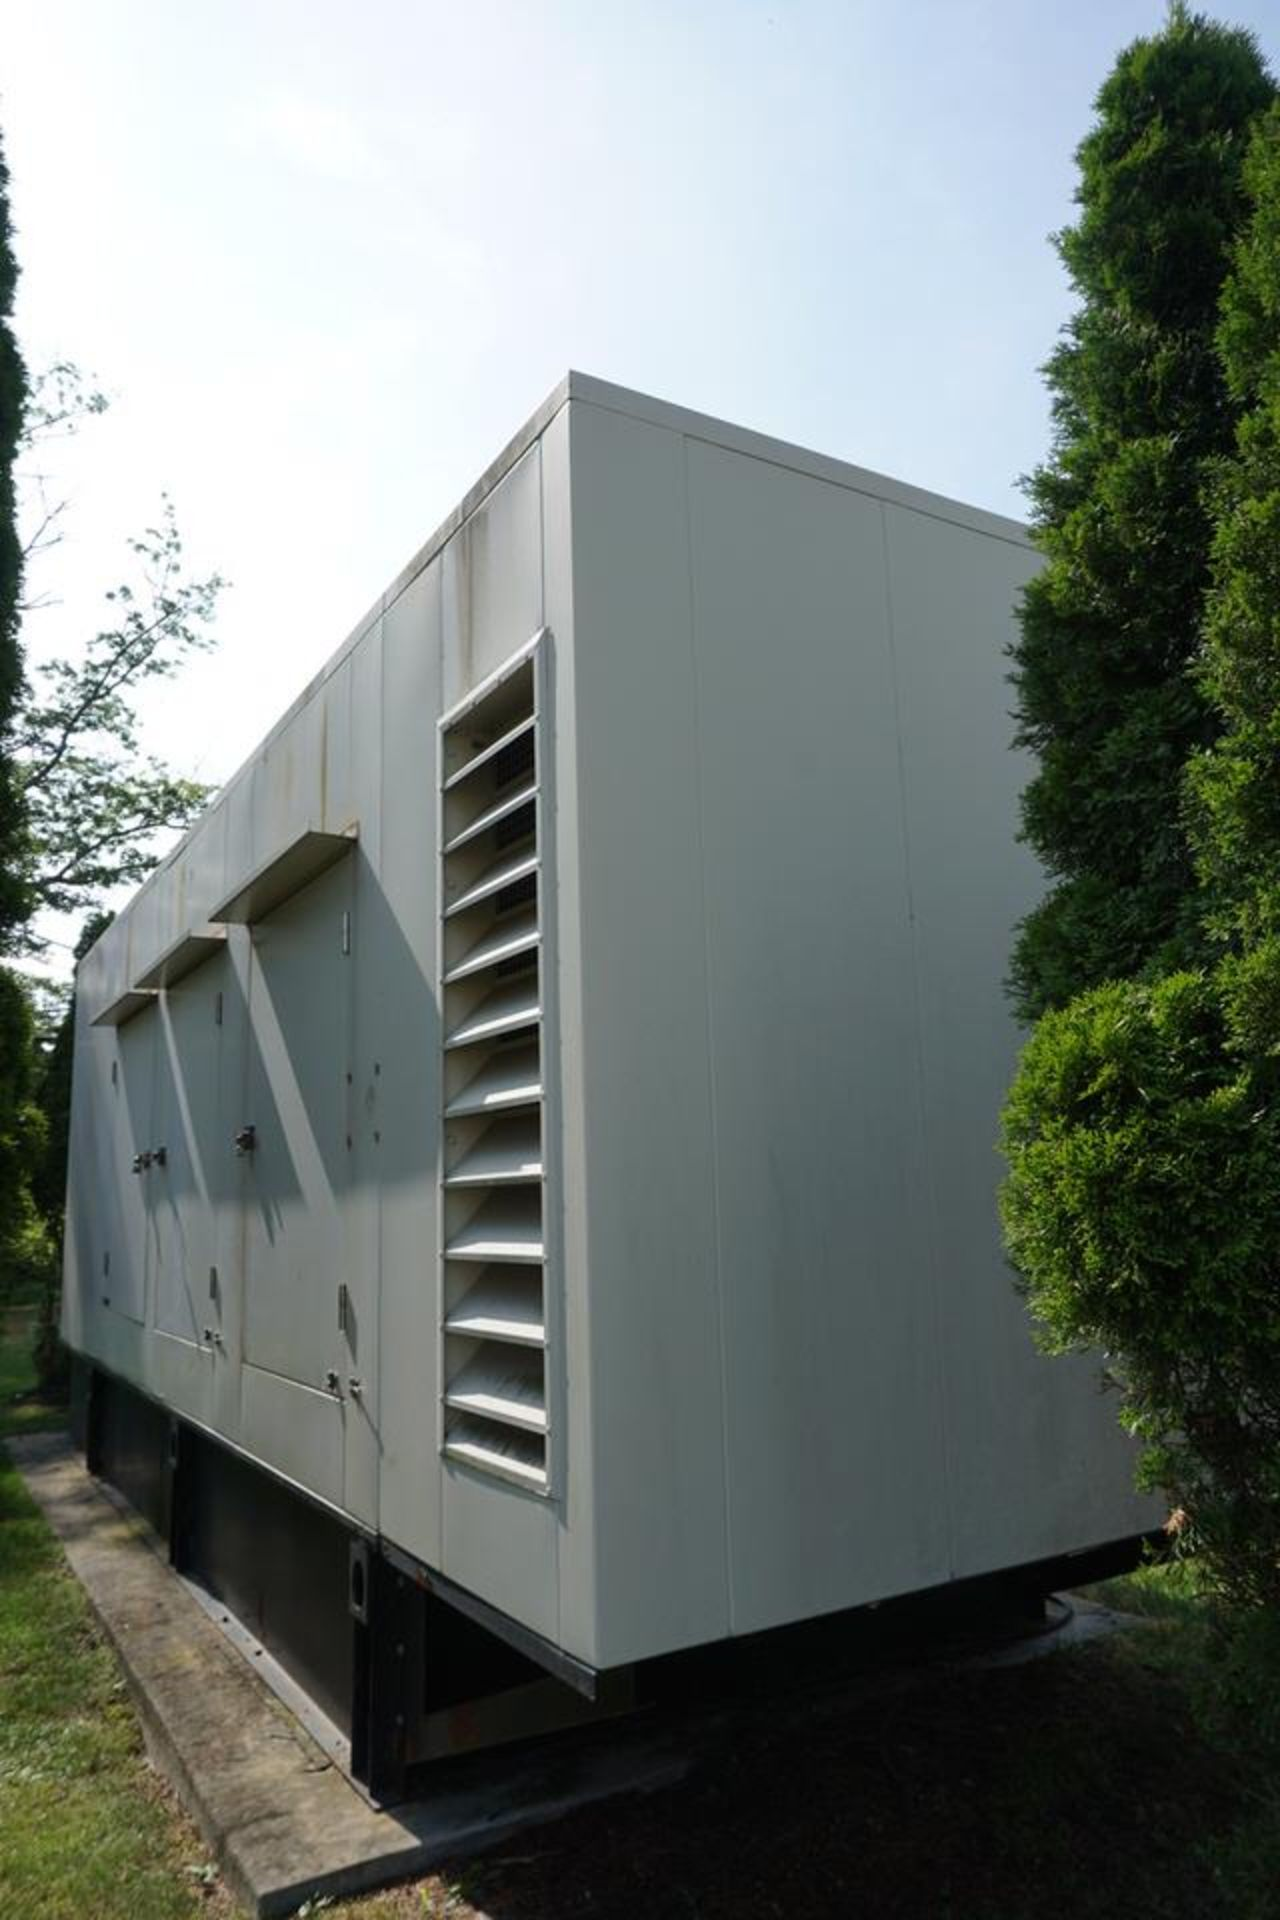 2007 CATERPILLAR BACK UP GENERATOR, ENGINE MODEL: C32 W/ EMCP3.3 CONTROL, 173.9 HOURS, 1250 KVA - Image 3 of 25